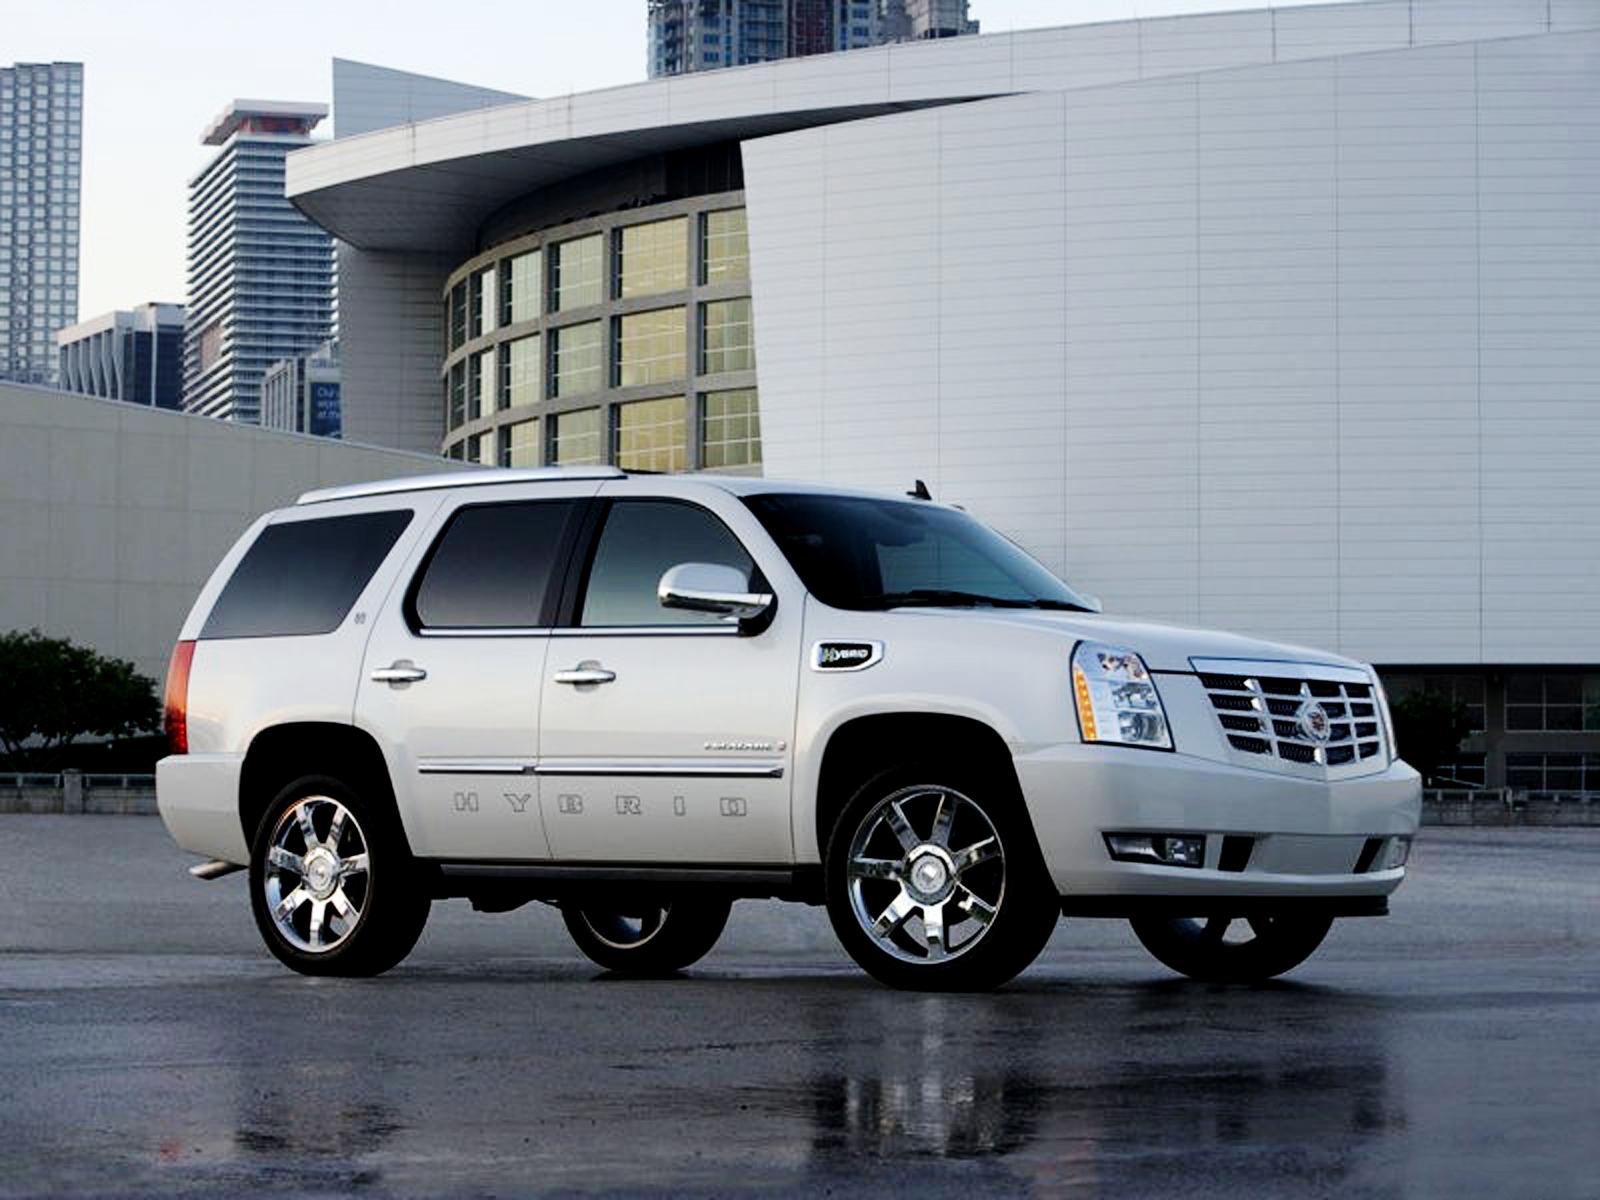 http://3.bp.blogspot.com/-CvG5CKnOtOY/T23M6QETI-I/AAAAAAAAA-k/VfAkNm5wM7E/s1600/Hybrid_Cadillac_Escalade_4x4_Car_HD_Wallpaper.jpg